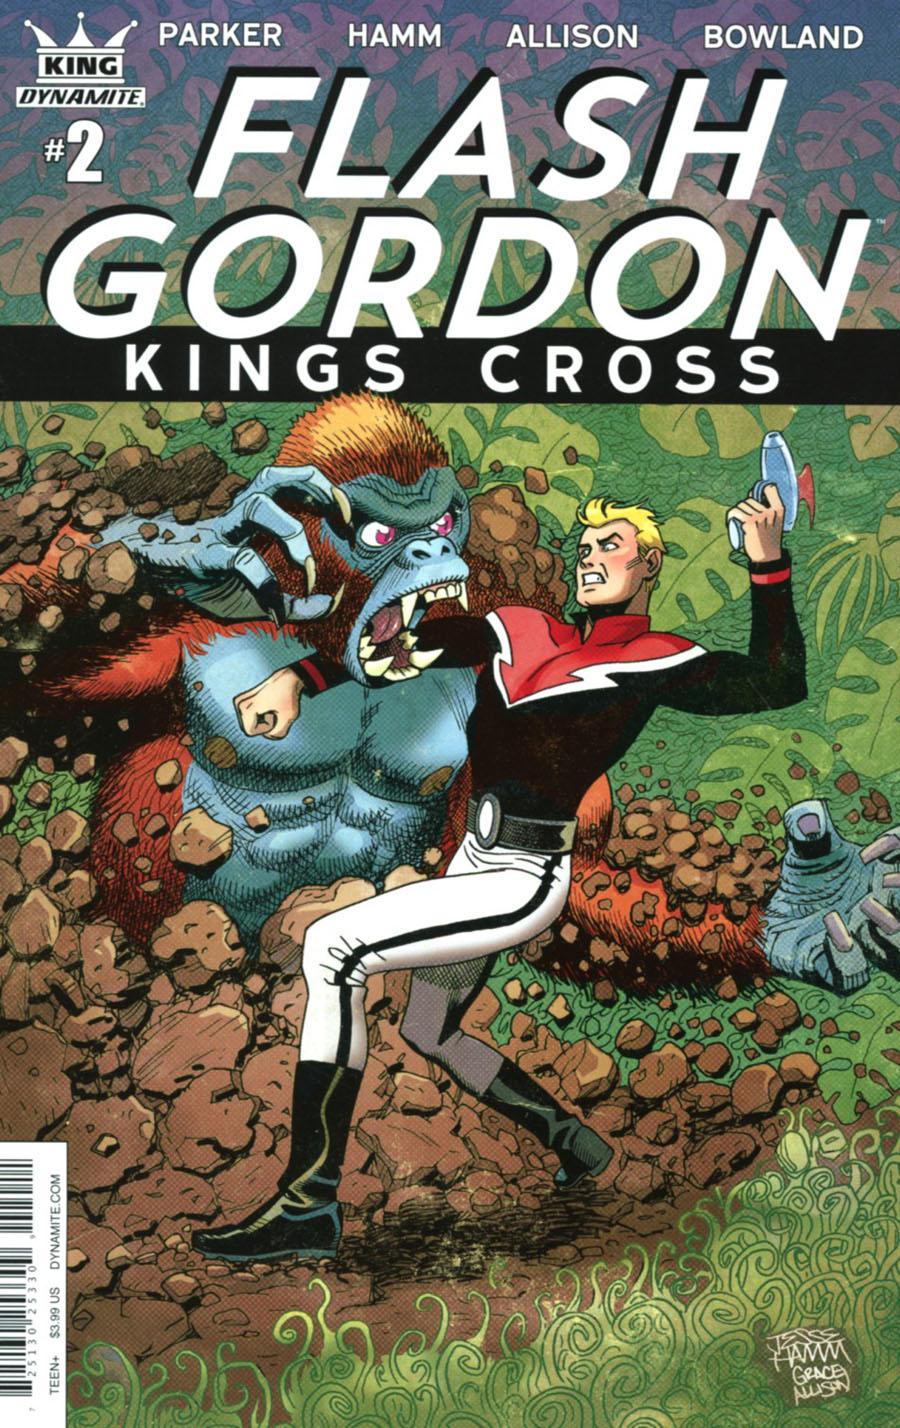 Flash Gordon Kings Cross #2 Cover A Regular Jesse Hamm & Grace Allison Cover